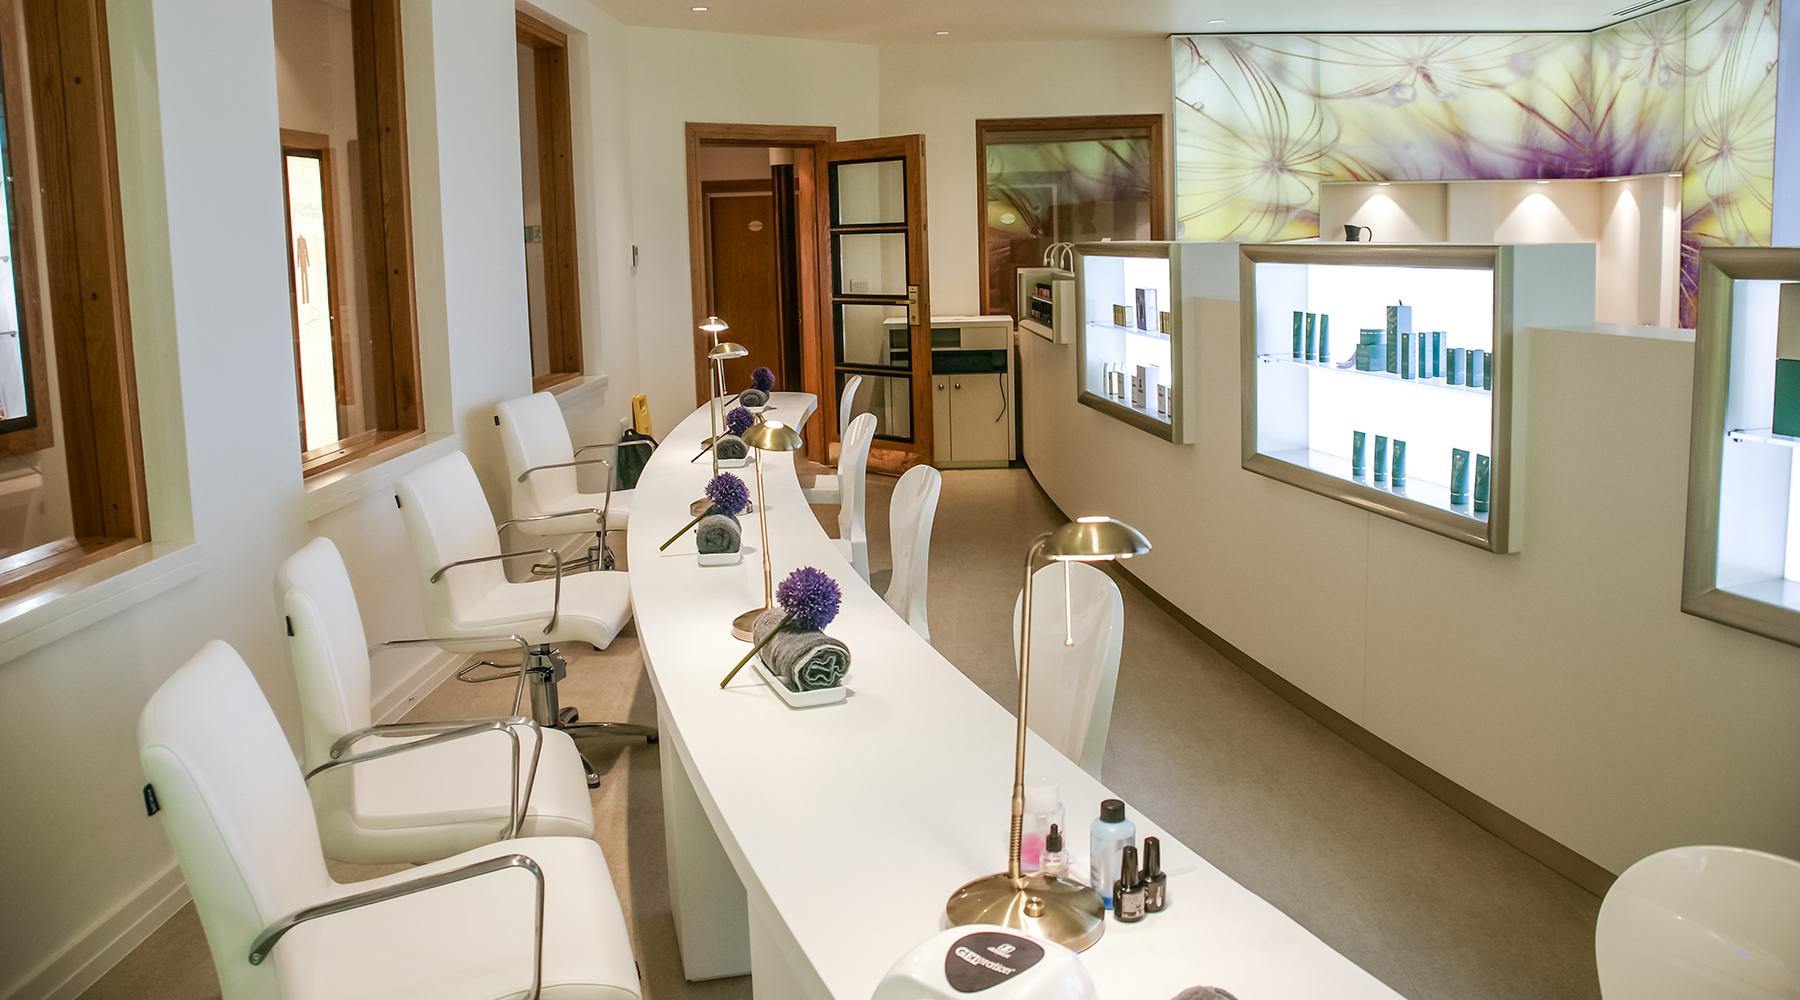 Champneys Resort Spa, Tring. Manicure & Pedicure Salon